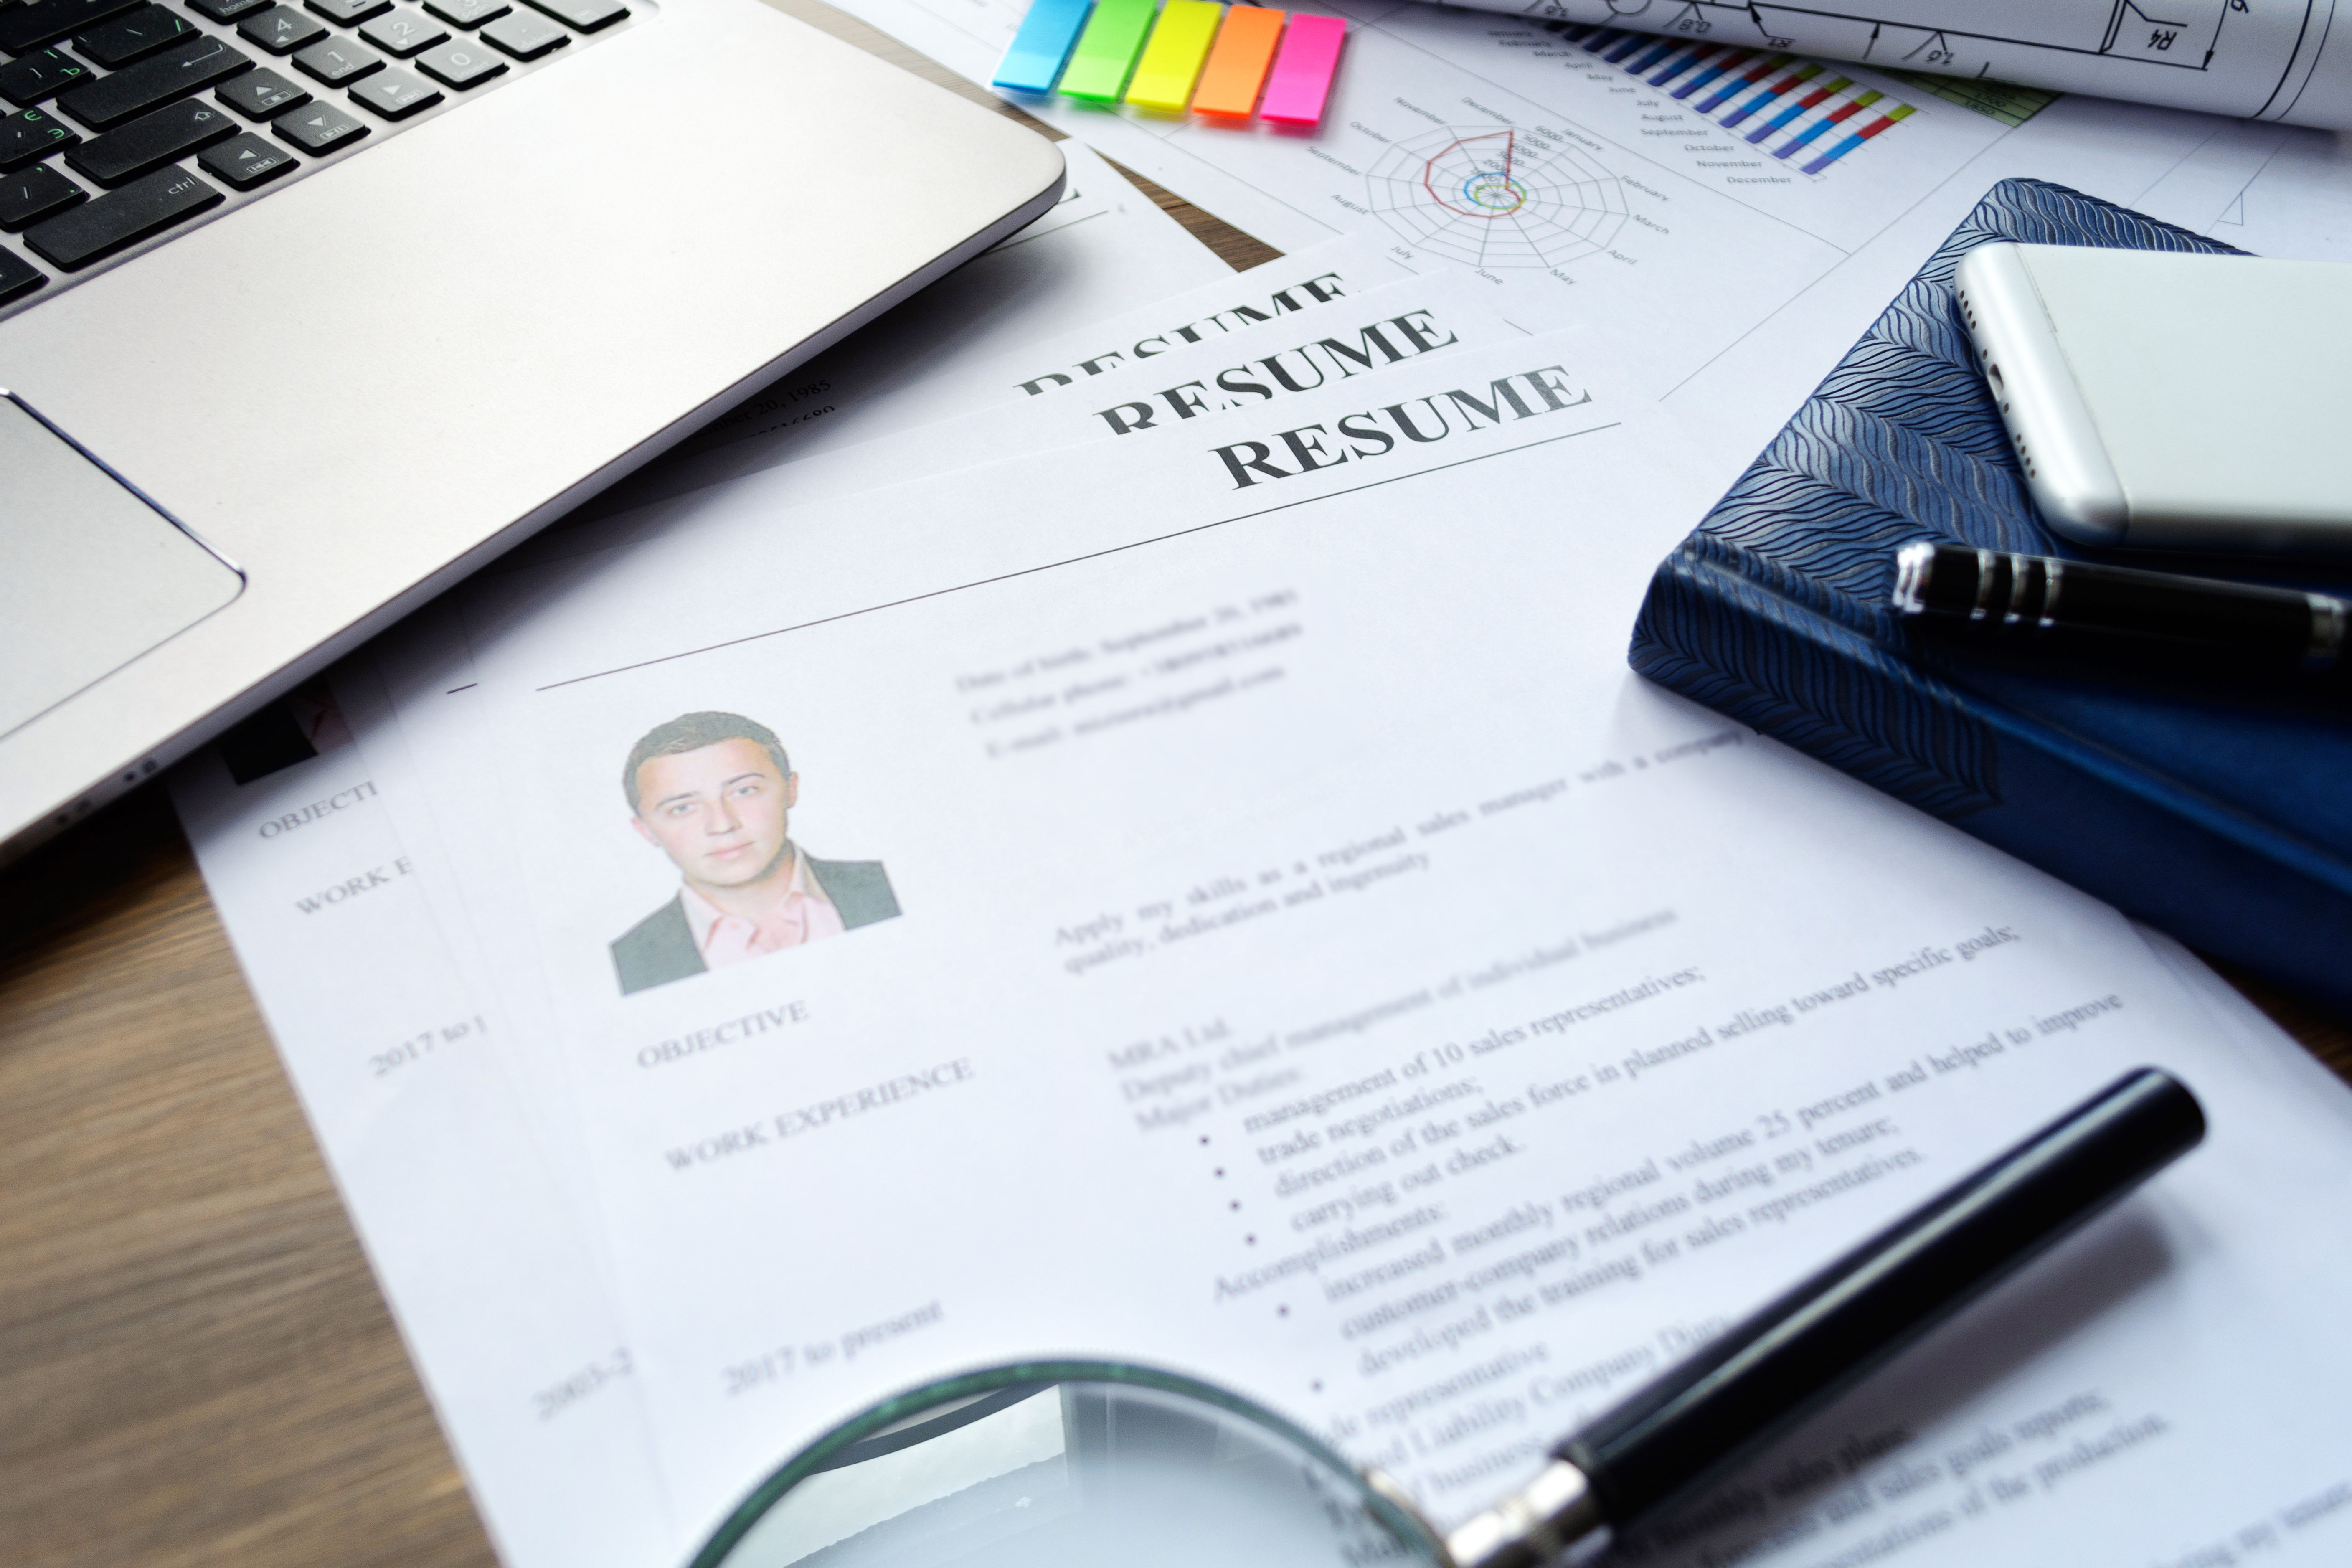 Resume (curriculum Vitae, CV)